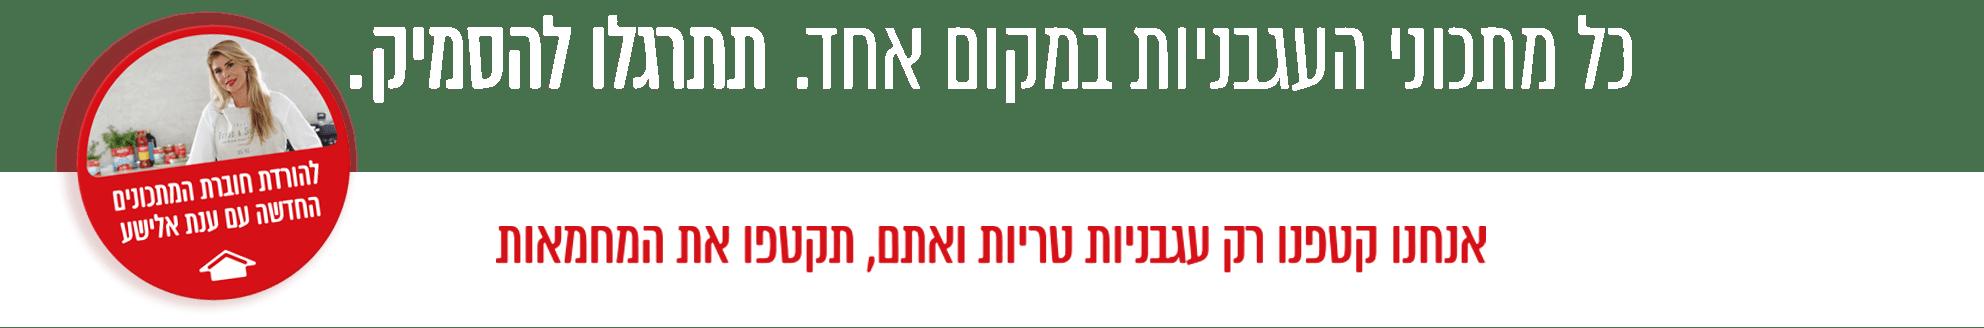 ענת אלישע